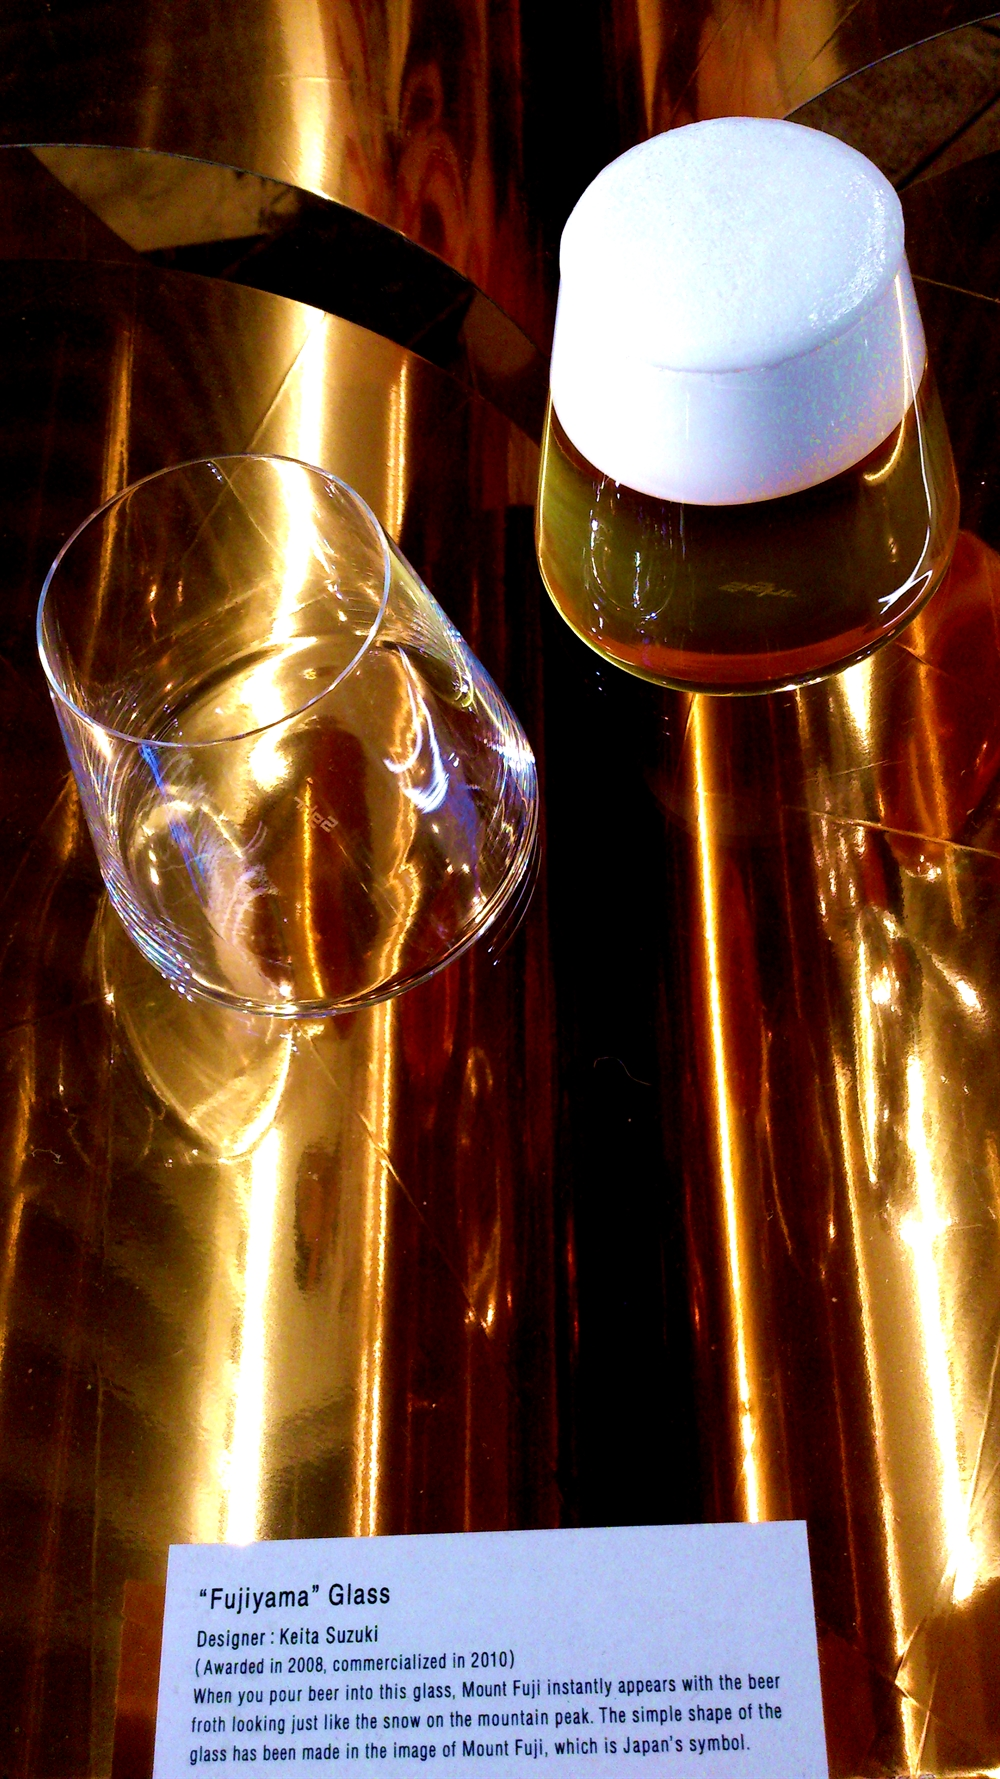 30 fuorisalone milan design week 2015 rossana orlandi nika zupanc gufram marimekko scarlet splendour interior design luxurious furniture meble luksusowe projektowanie marcel wanders